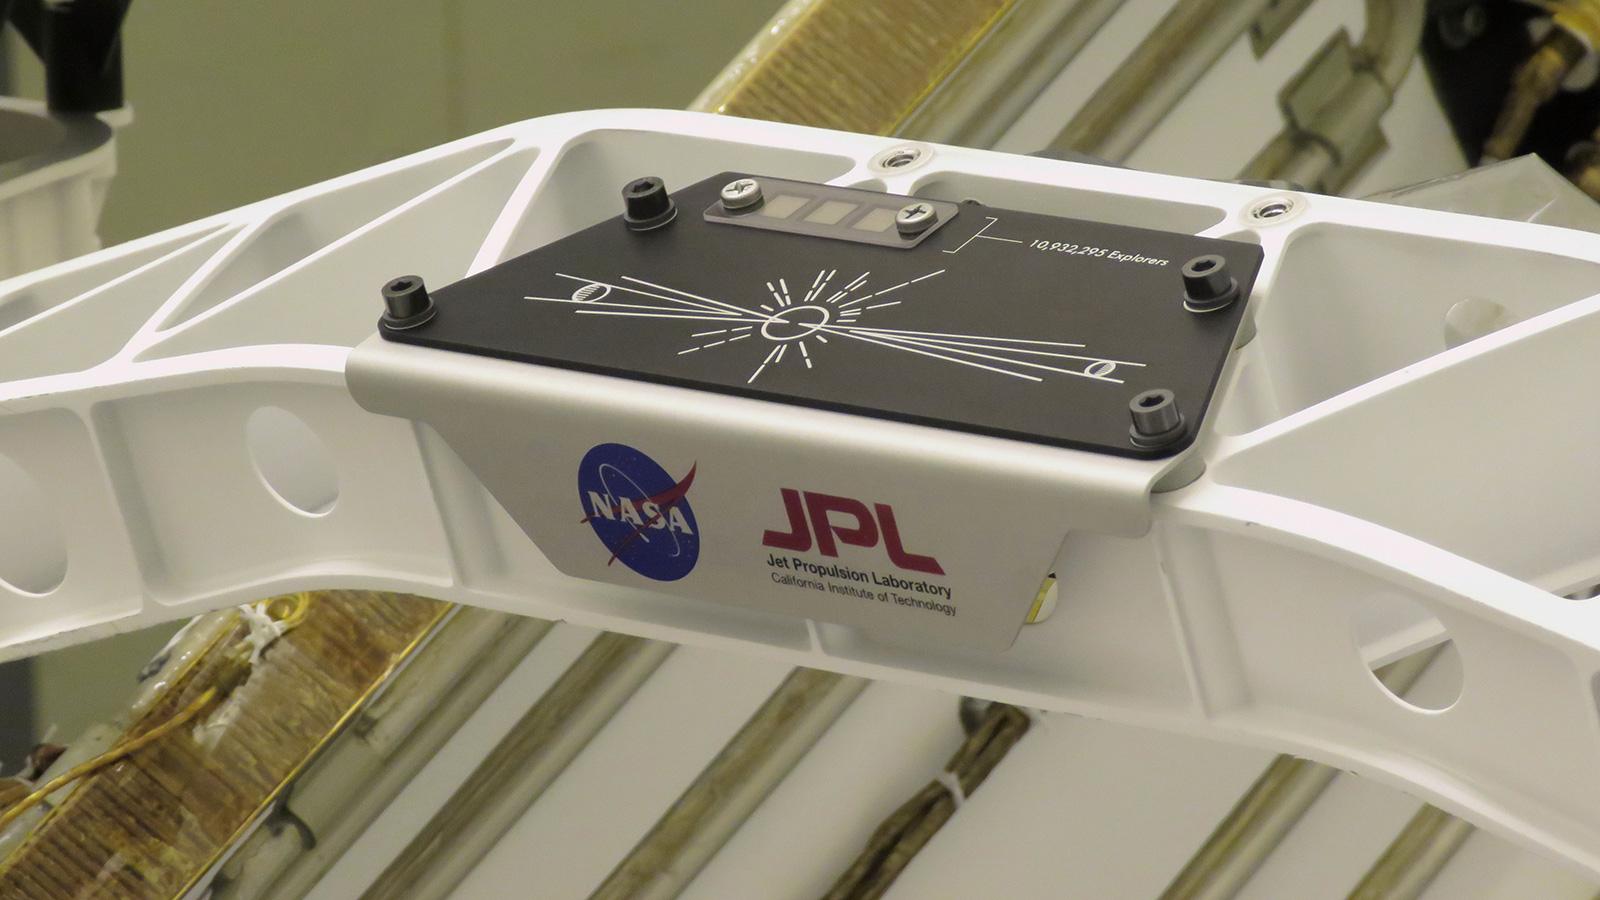 NASA's Perseverance Mars rover gets wheels, parachute - International Business Times, Singapore Edition